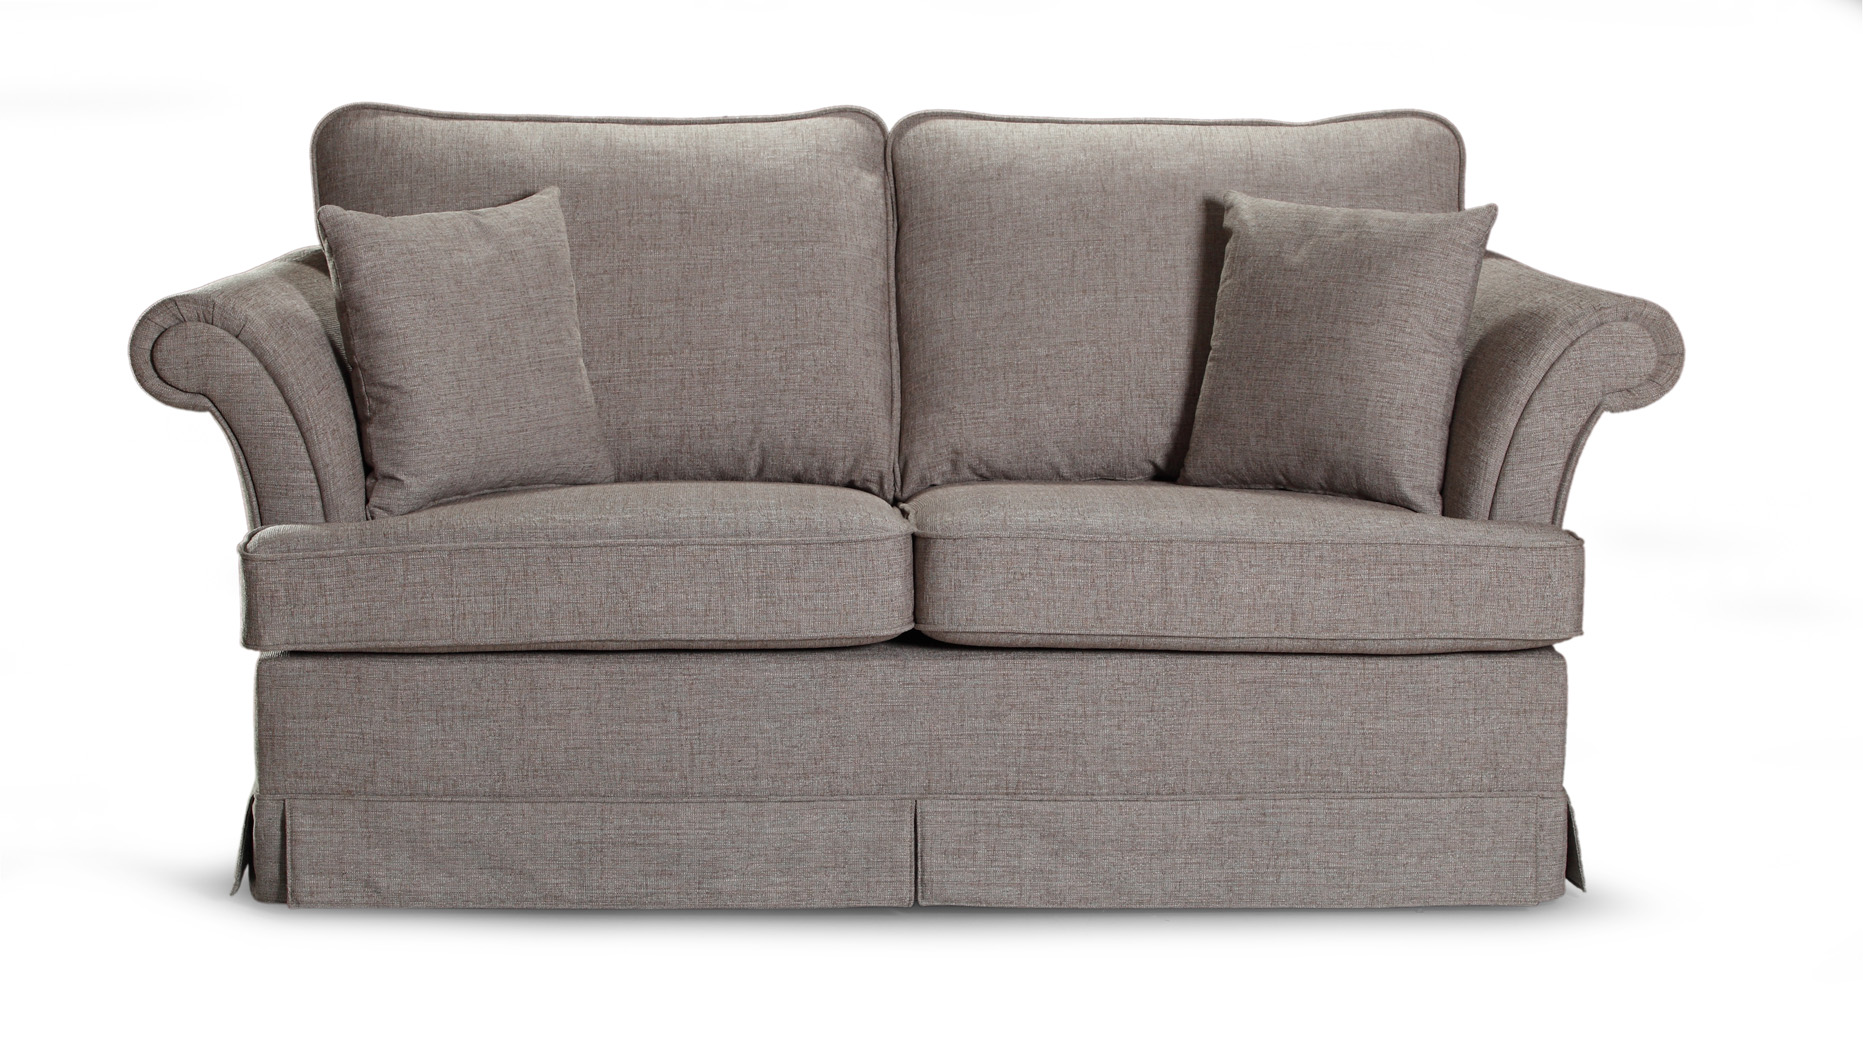 Canapea fixa 2 locuri tapitata cu stofa Afrodyta